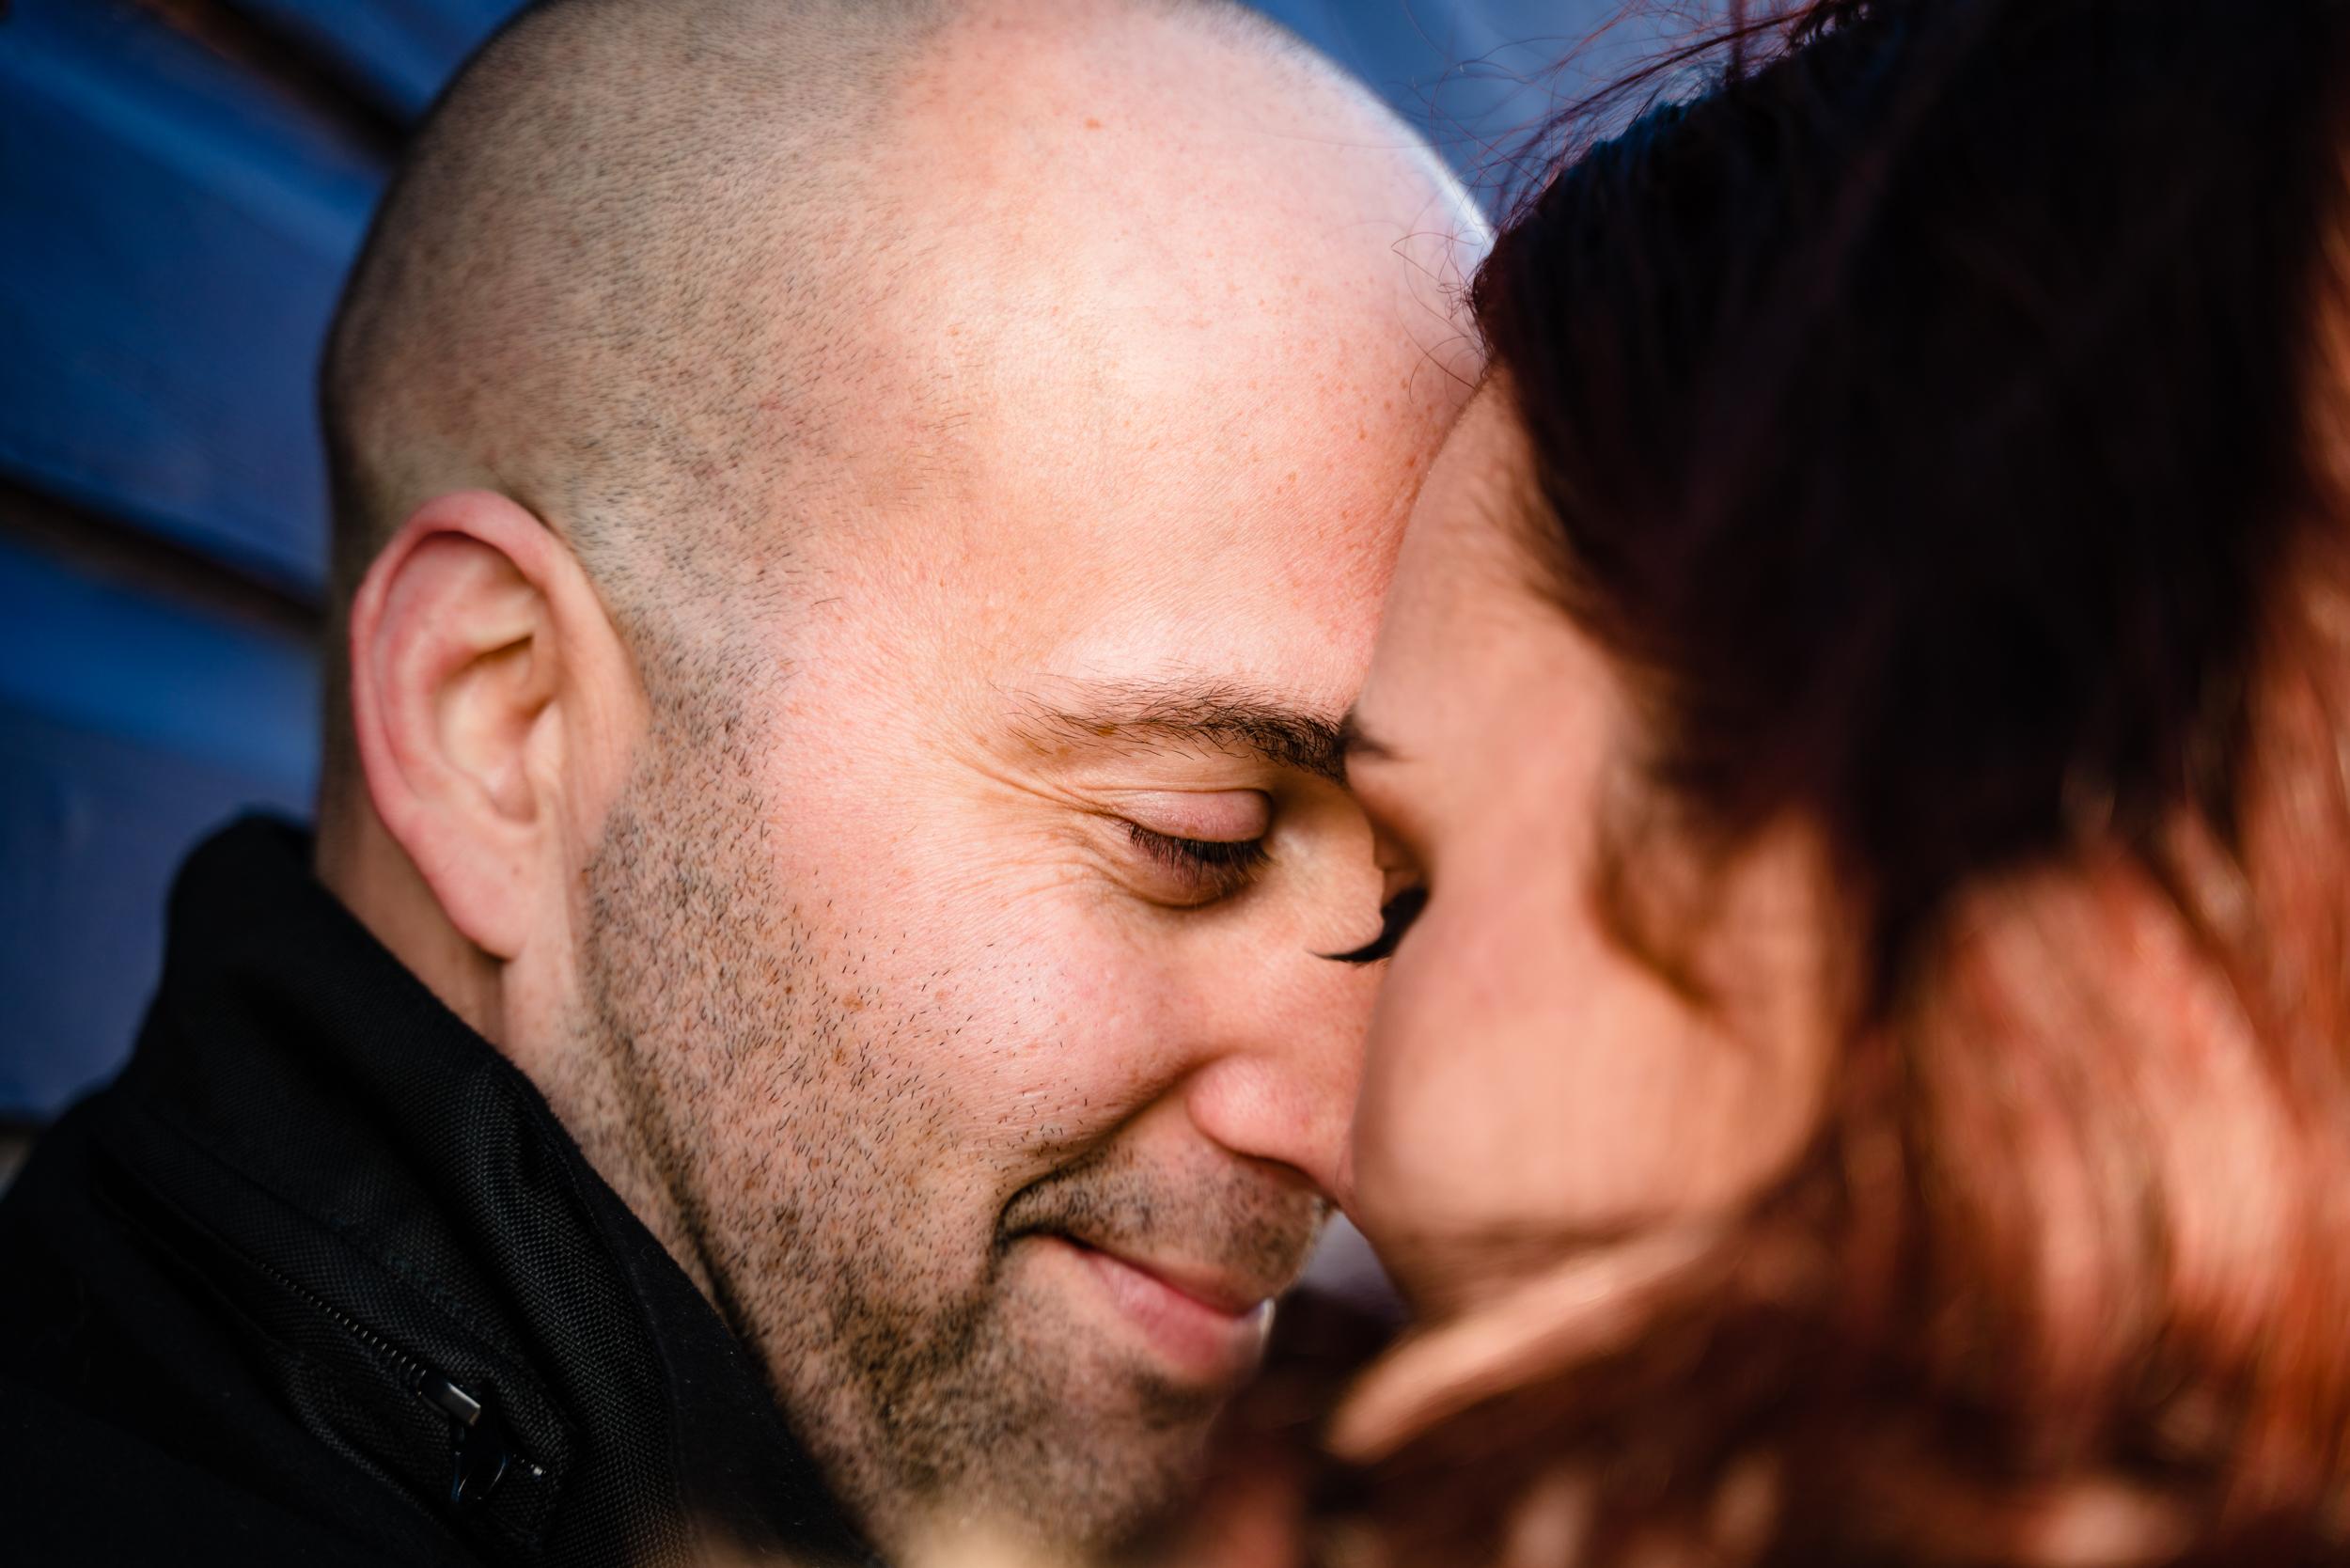 Sarah&Shayne-Halifax-engagement-weddingphotography-weddingphotographers-novascotia (7 of 41).jpg